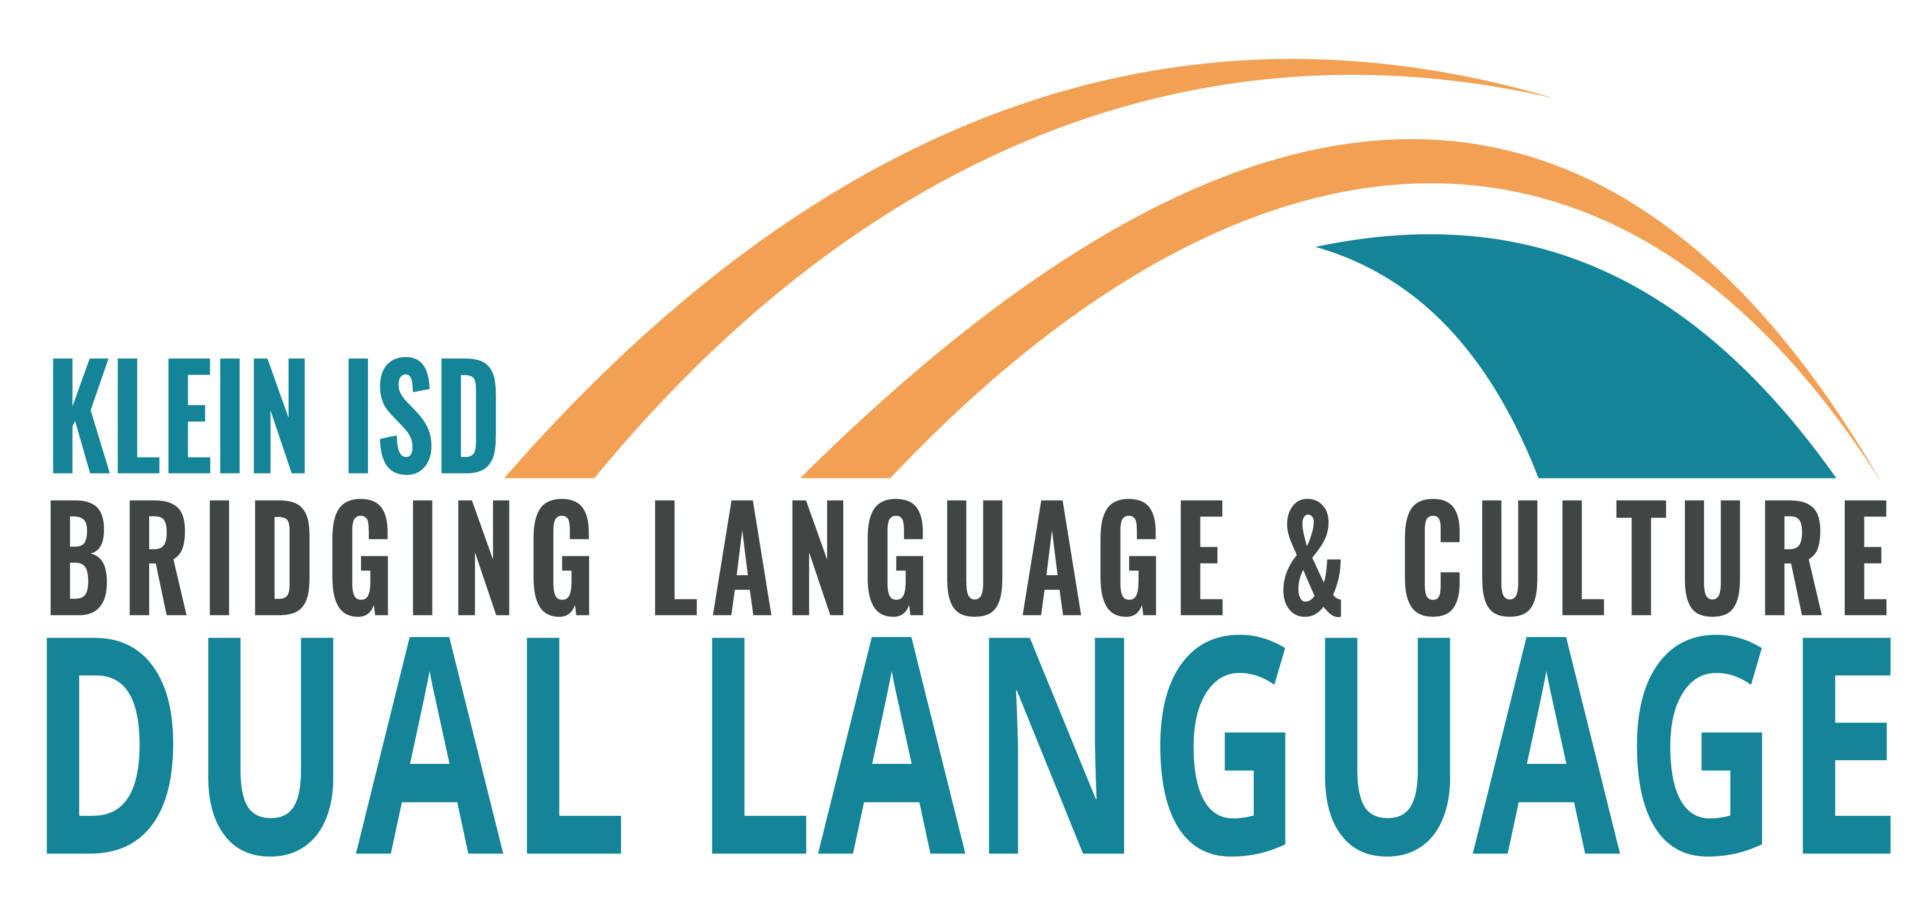 Klein's Dual Language Pathway is Growing!